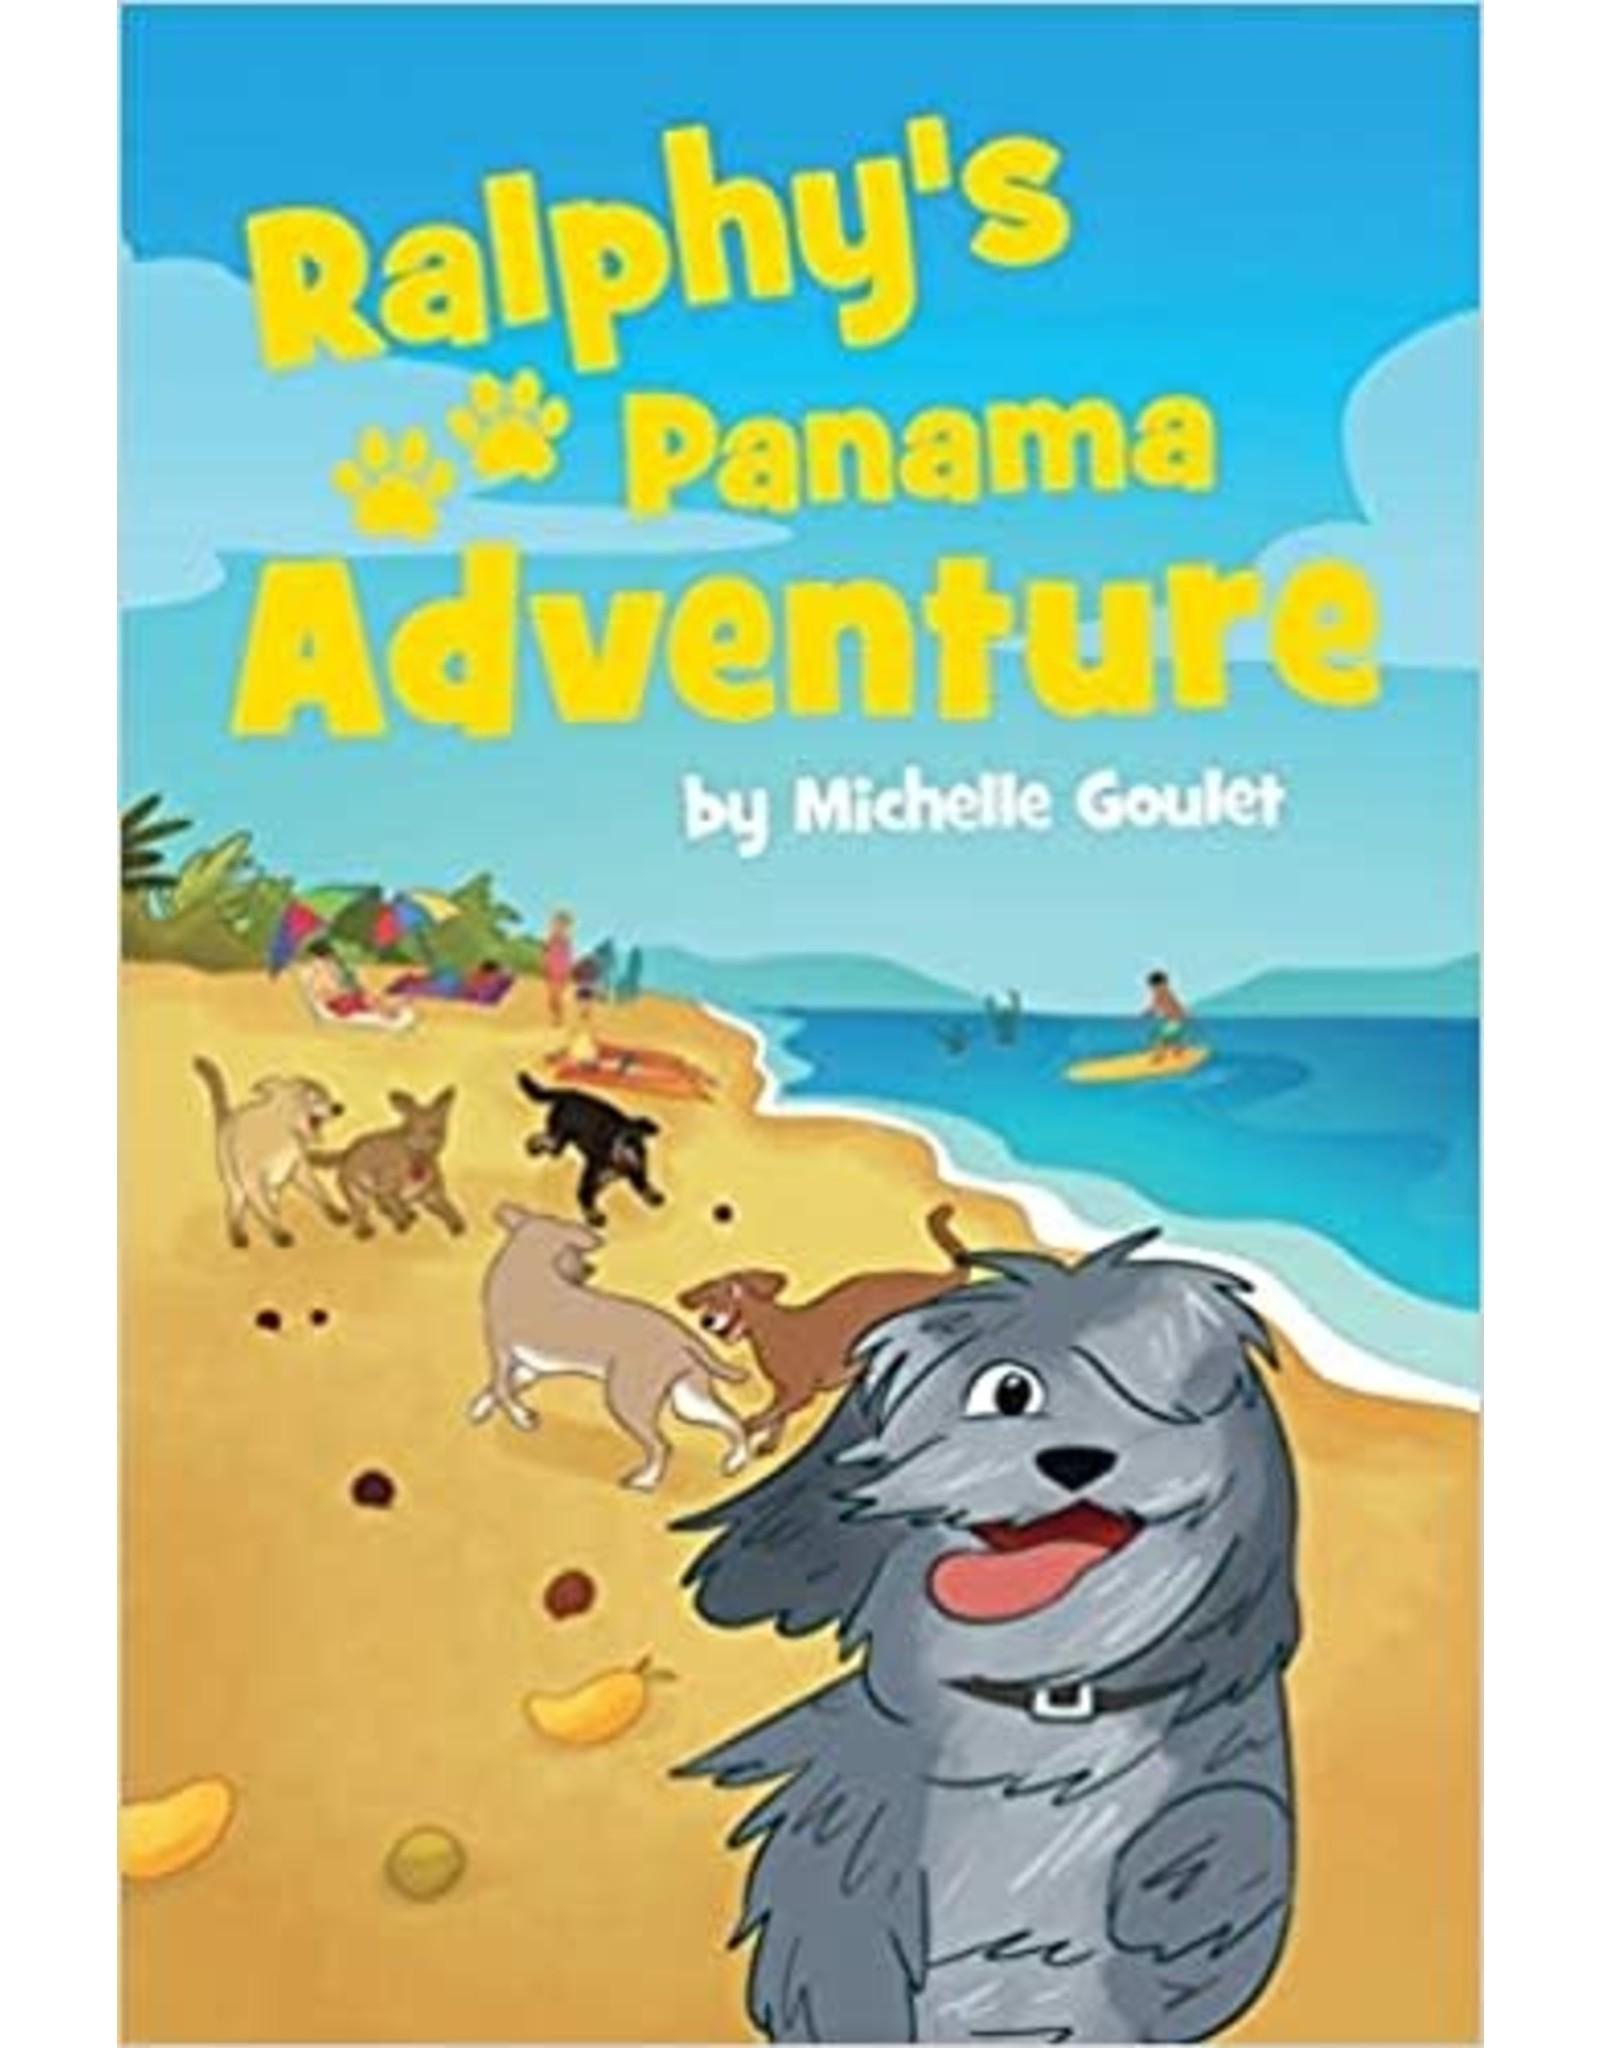 Ralphy's Panama Adventure